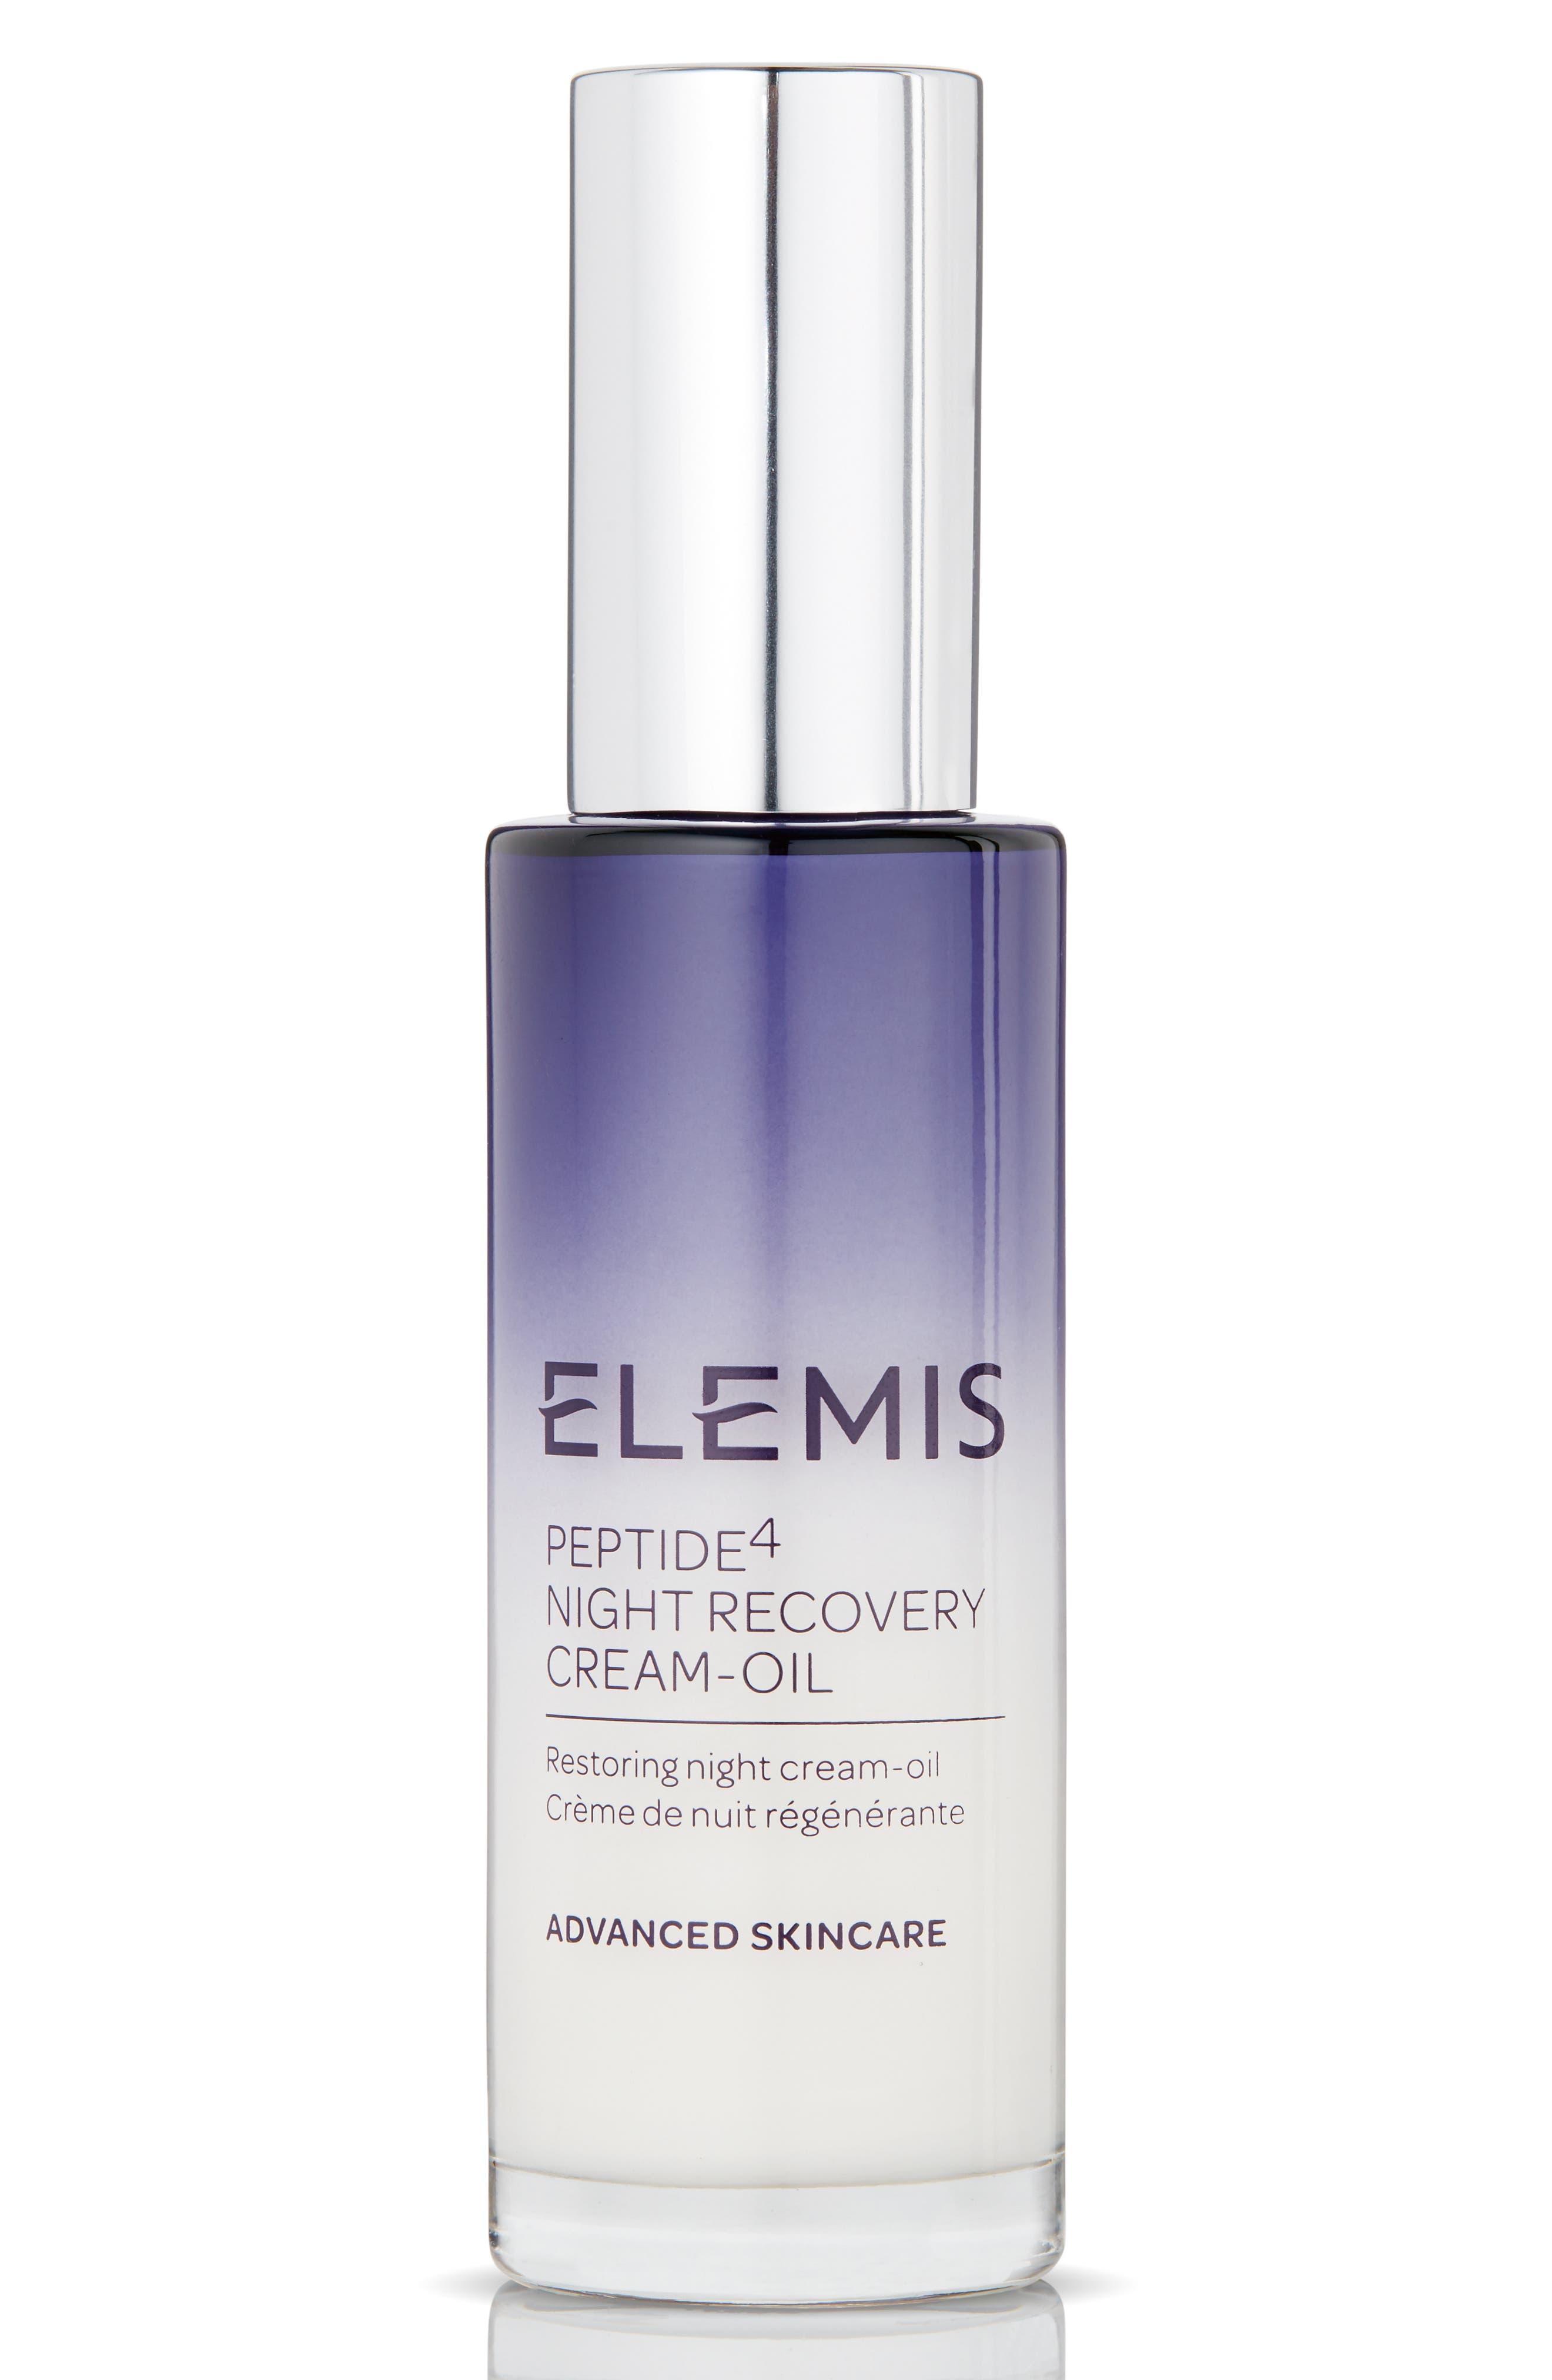 Elemis Peptide4 Night Recovery Cream-Oil